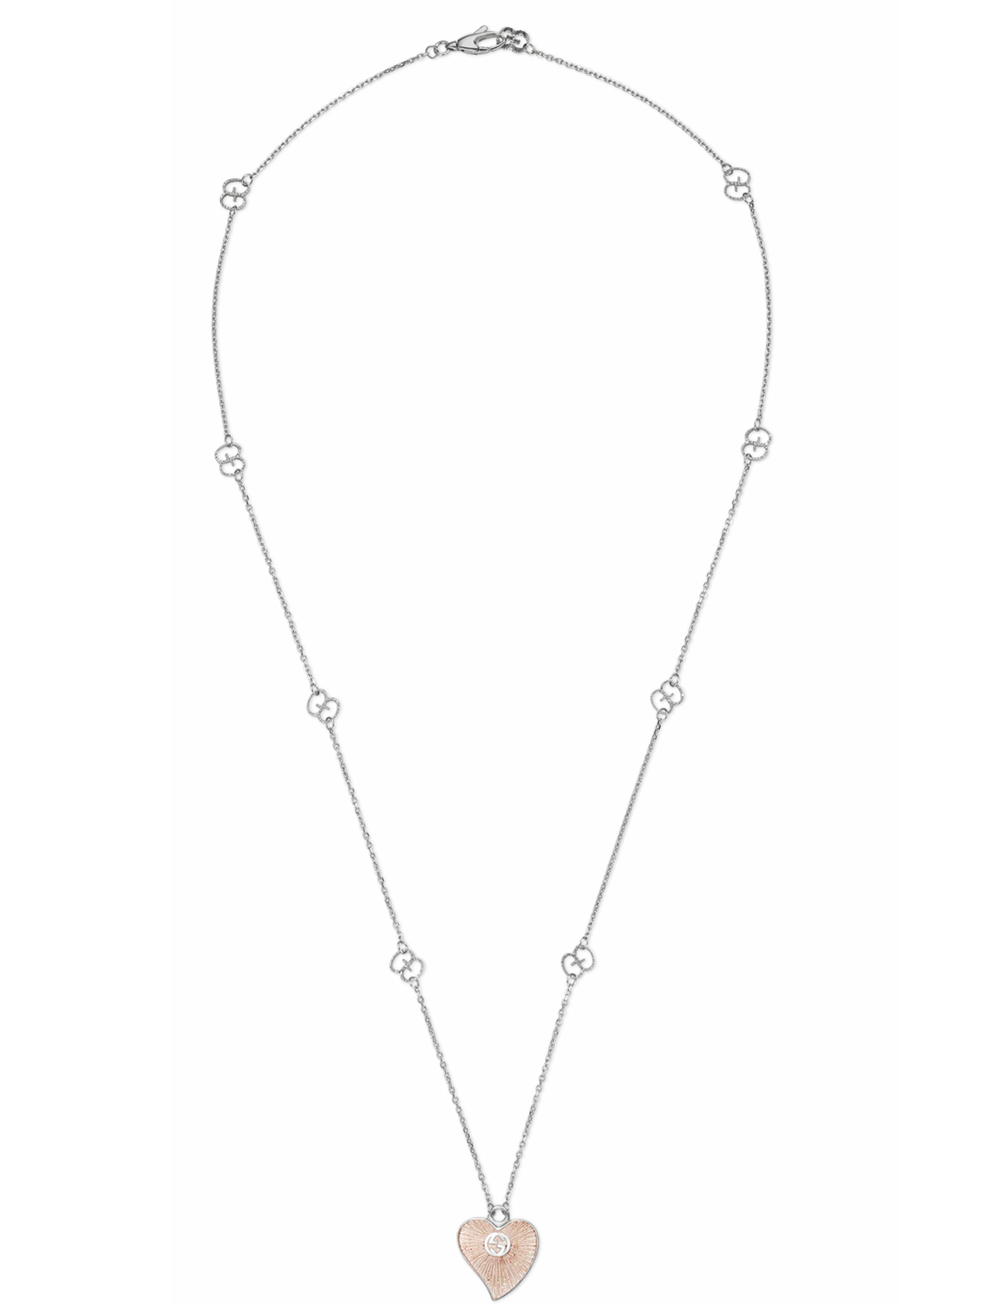 Gucci 2017 SS Women's Pre Collection - Jewelry, Photo courtesy of Gucci